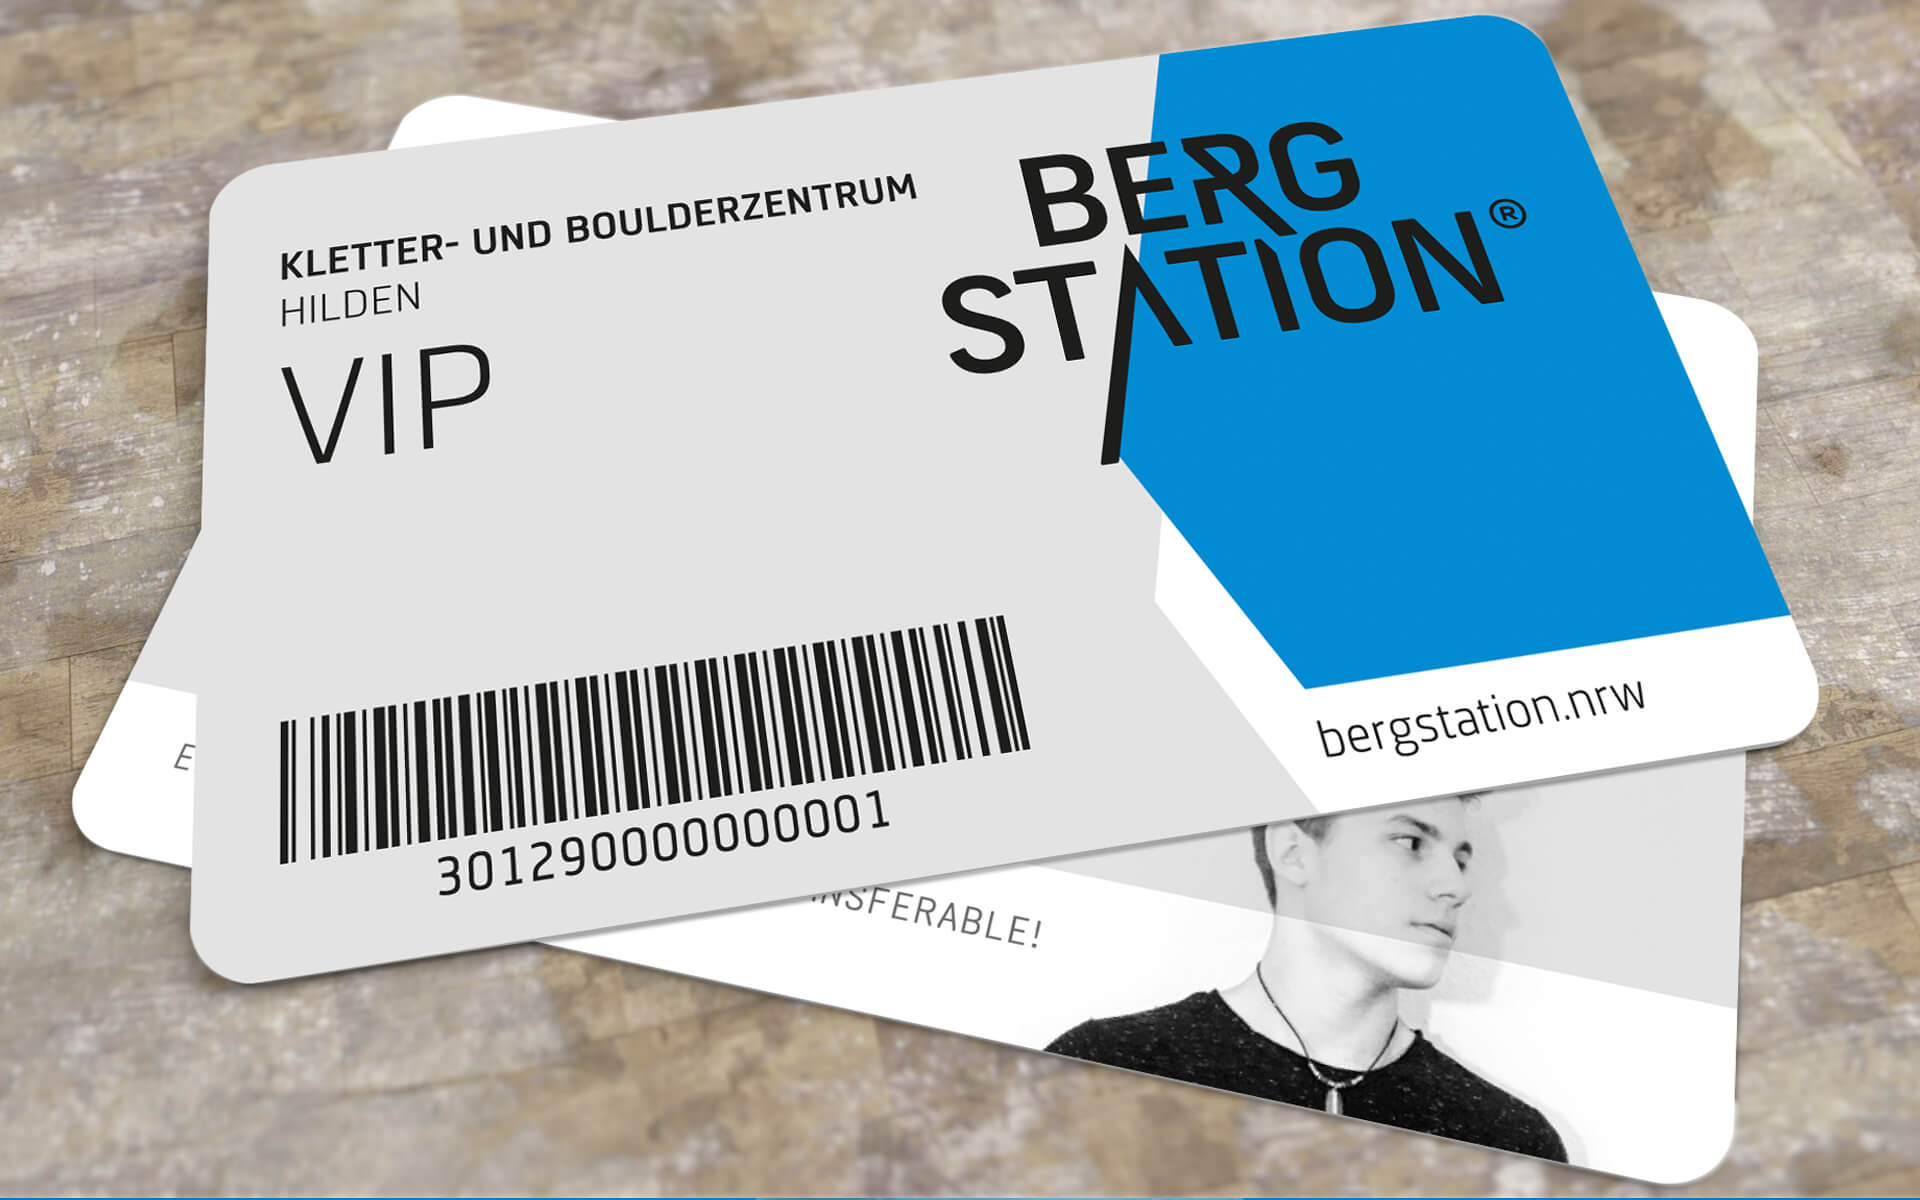 Bergstation Corporate Design, VIP Card